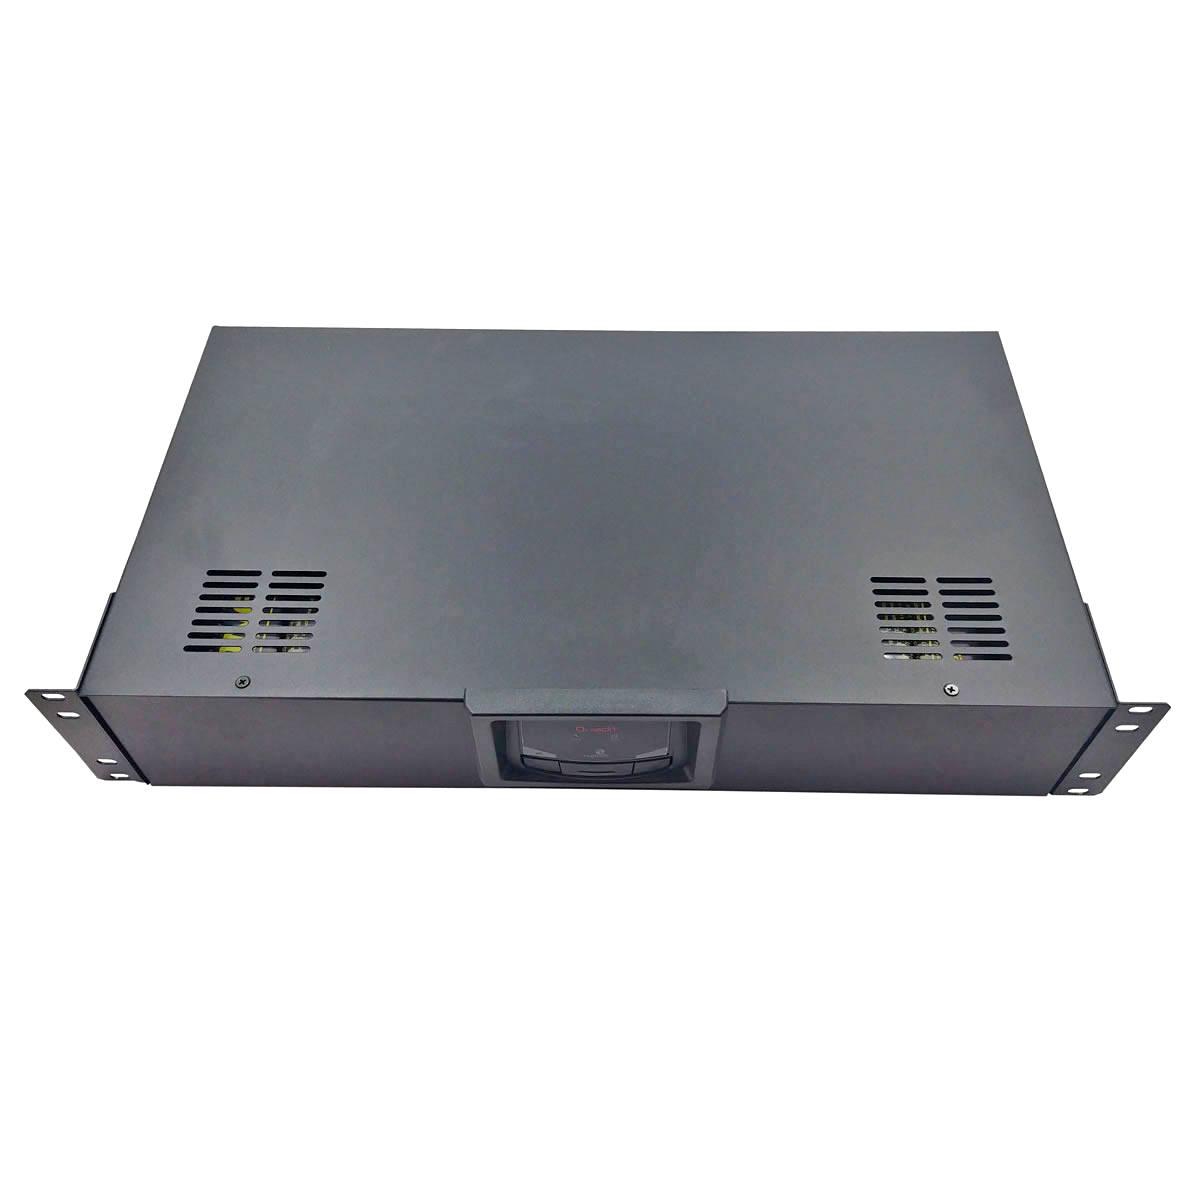 "Nobreak Rack 19"" 2U 1200VA Display Digital 7 Níveis de Proteção 8 Tomadas Conector de Bateria Bivolt Ragtech Quadri 4261"